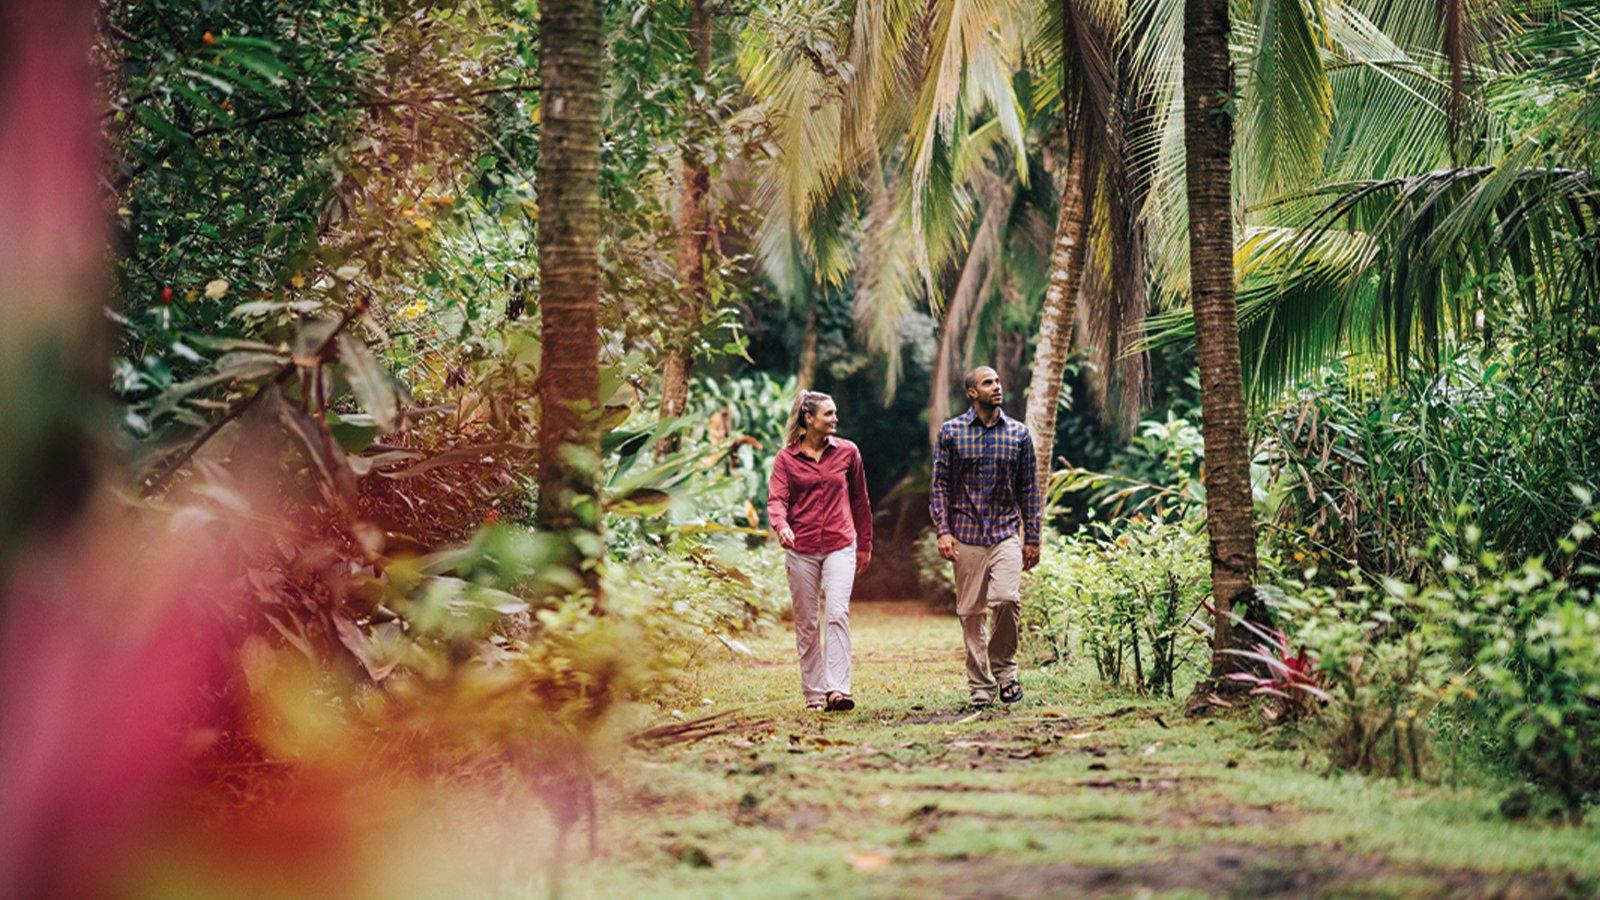 man and woman hiking wearing long sleeve hiking shirts and pants